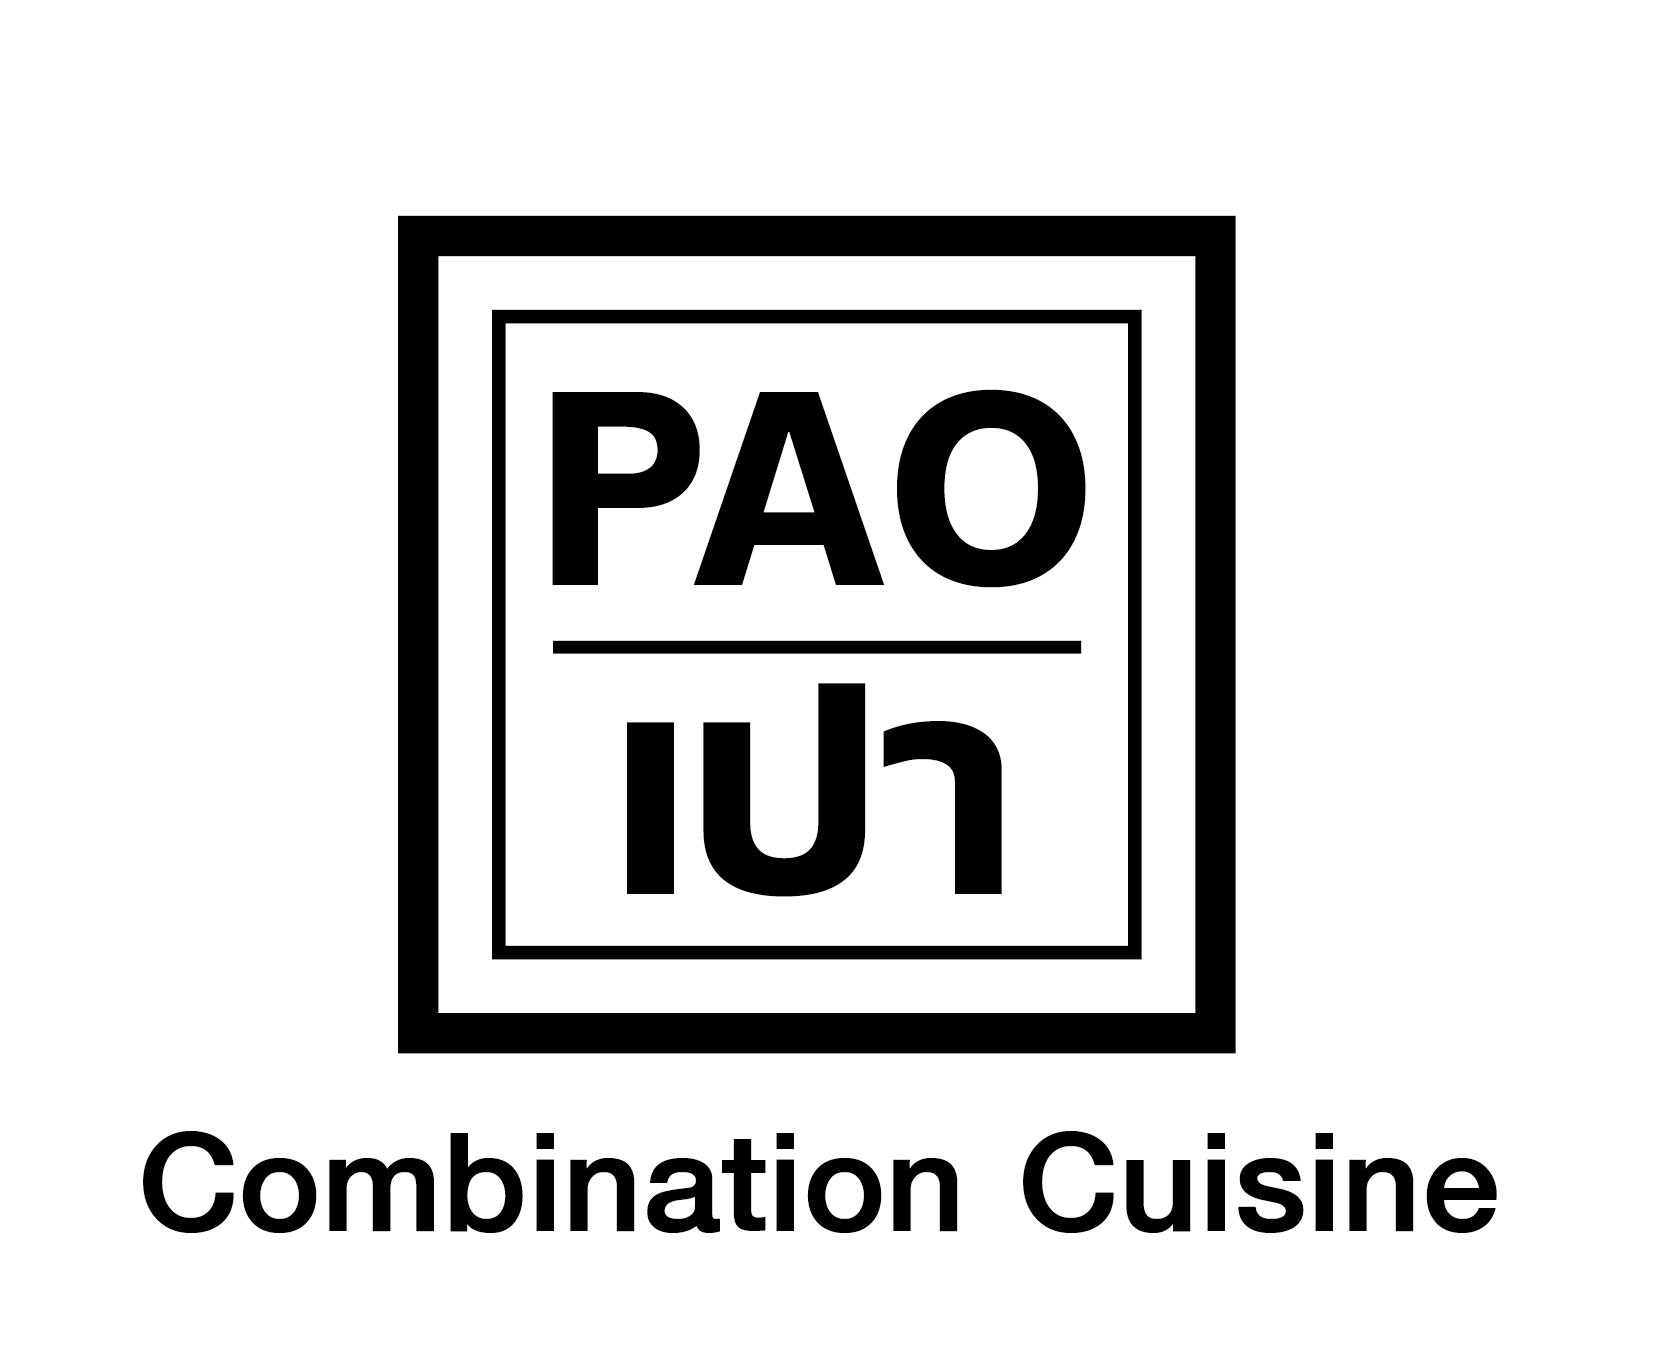 PAO Combination Cuisine